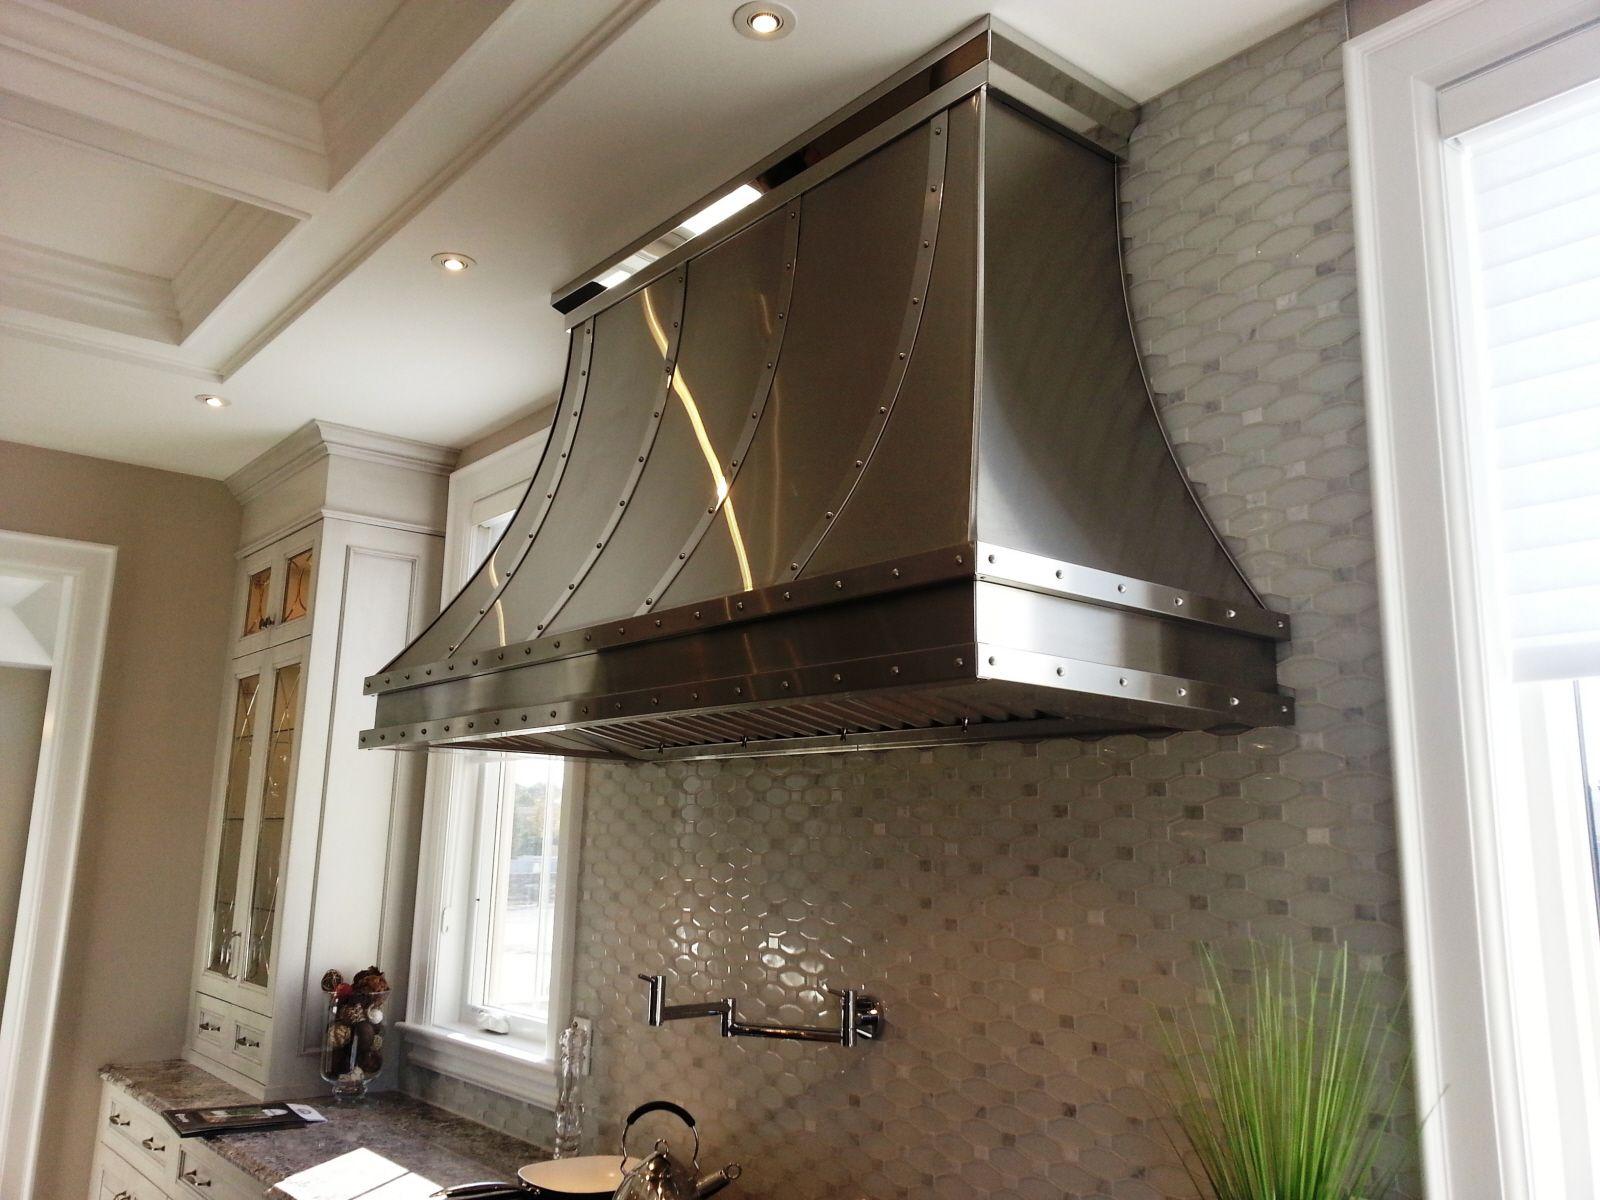 Best Kitchen Gallery: Hand Crafted Stainless Steel Range Hood S1 By Ck Metalcraft Llc of Metal Kitchen Hoods on rachelxblog.com